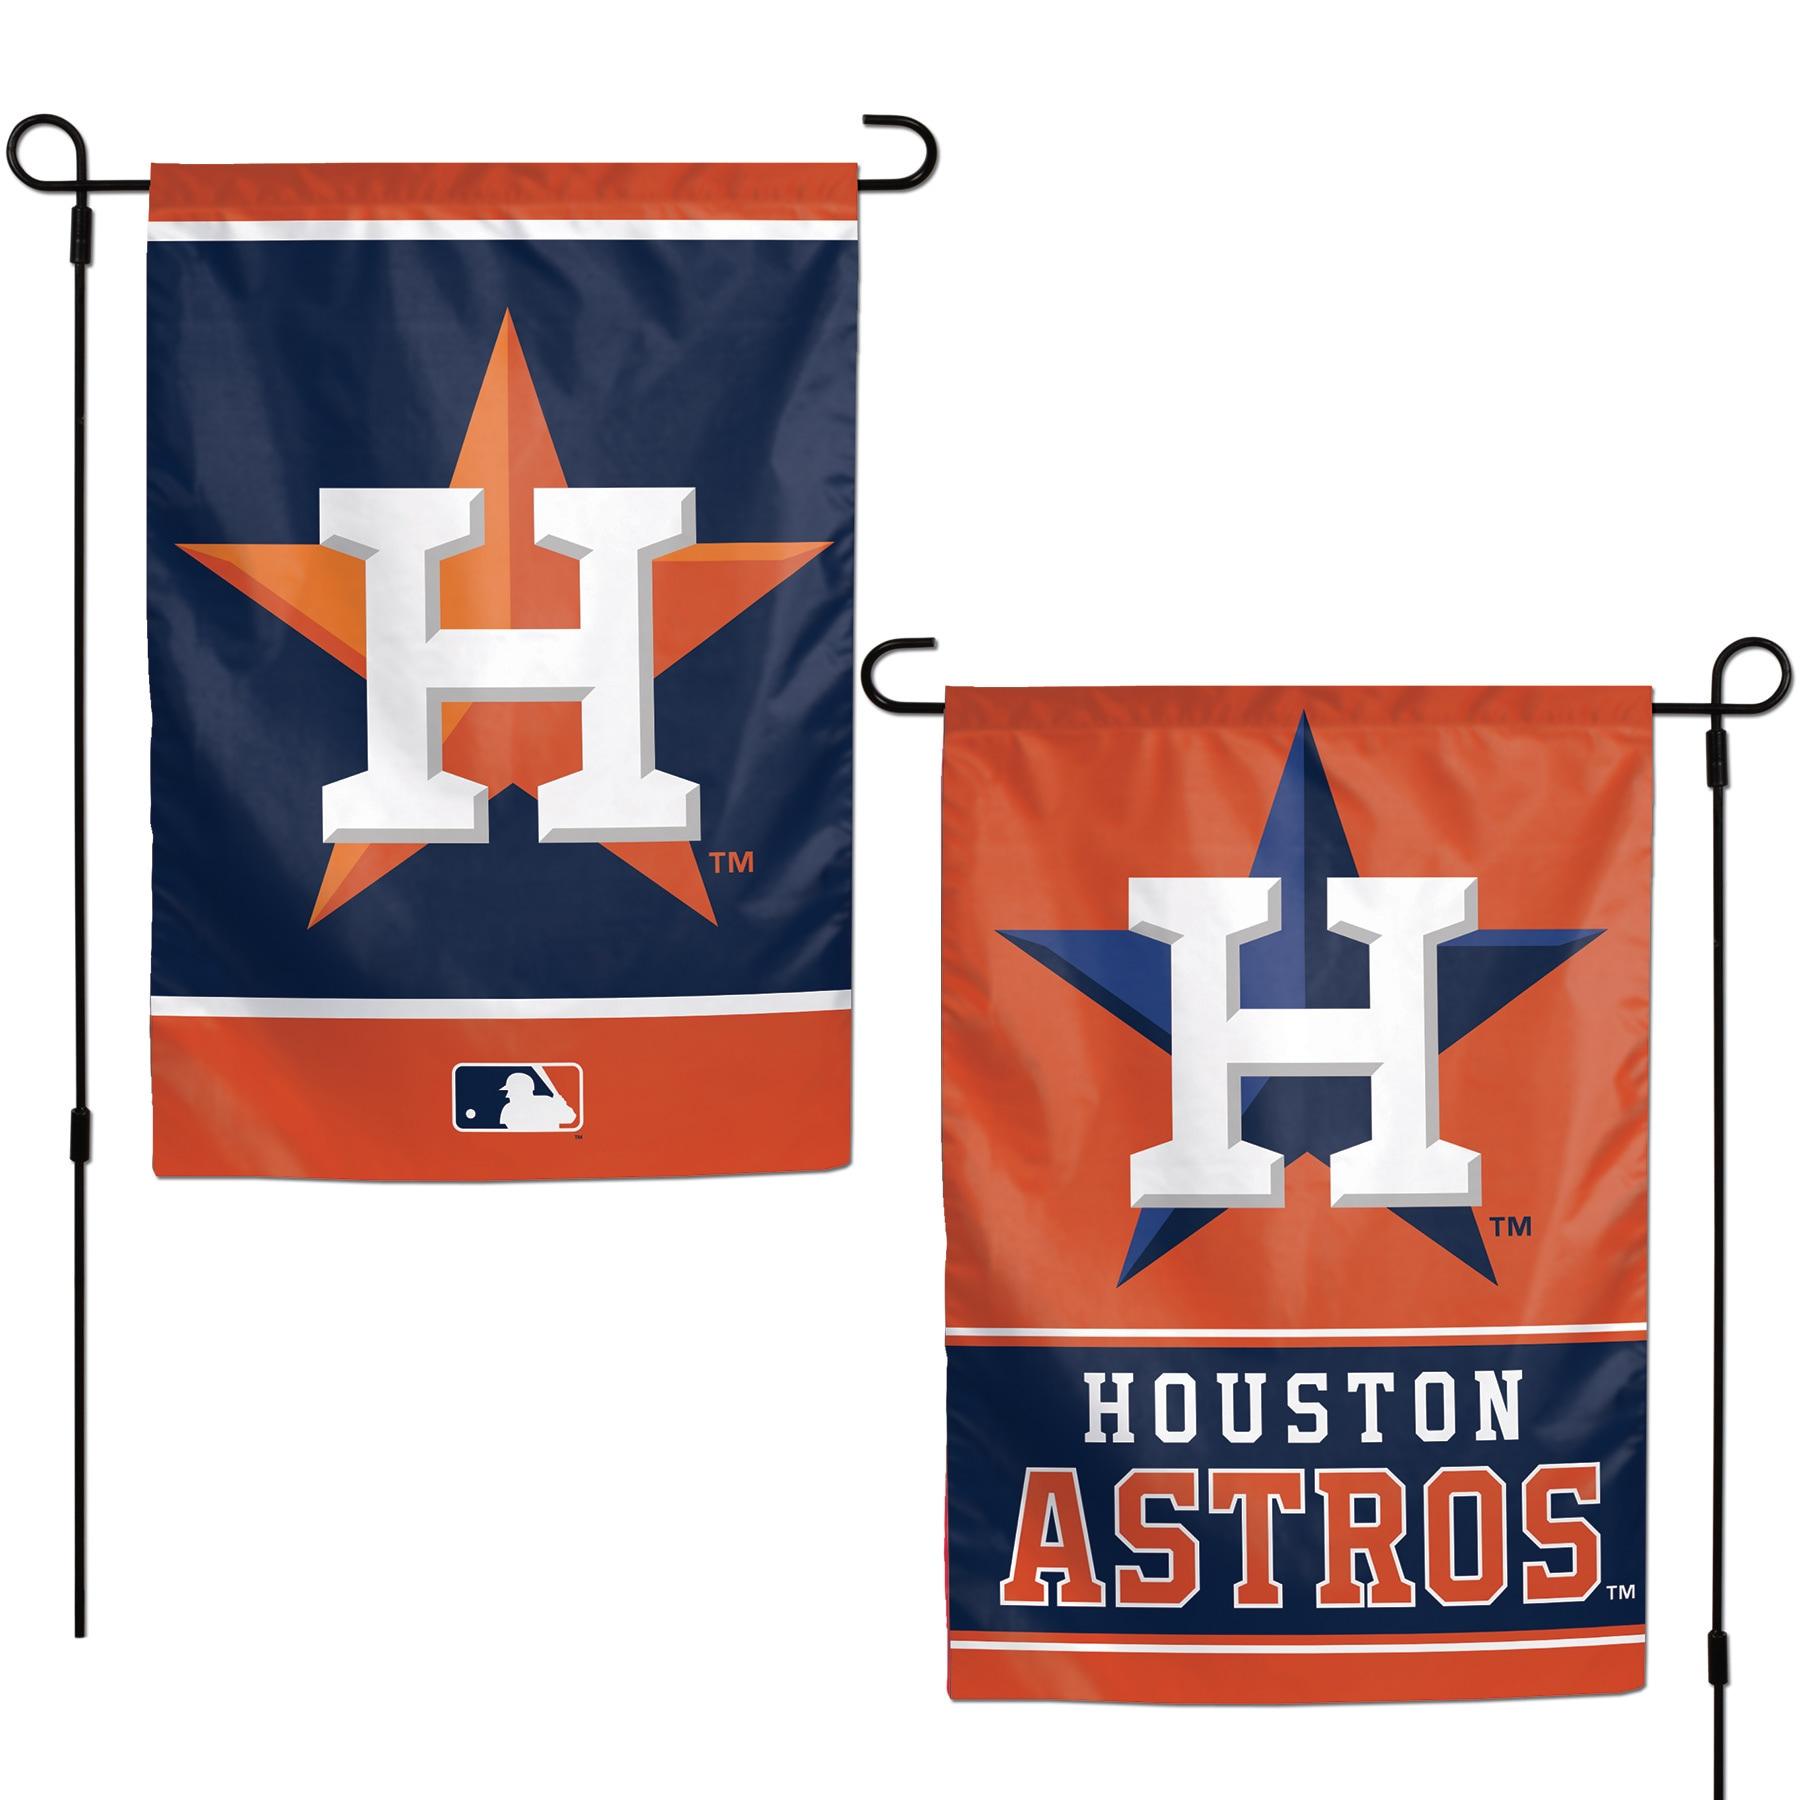 "Houston Astros WinCraft 12"" x 18"" Double-Sided Garden Flag"